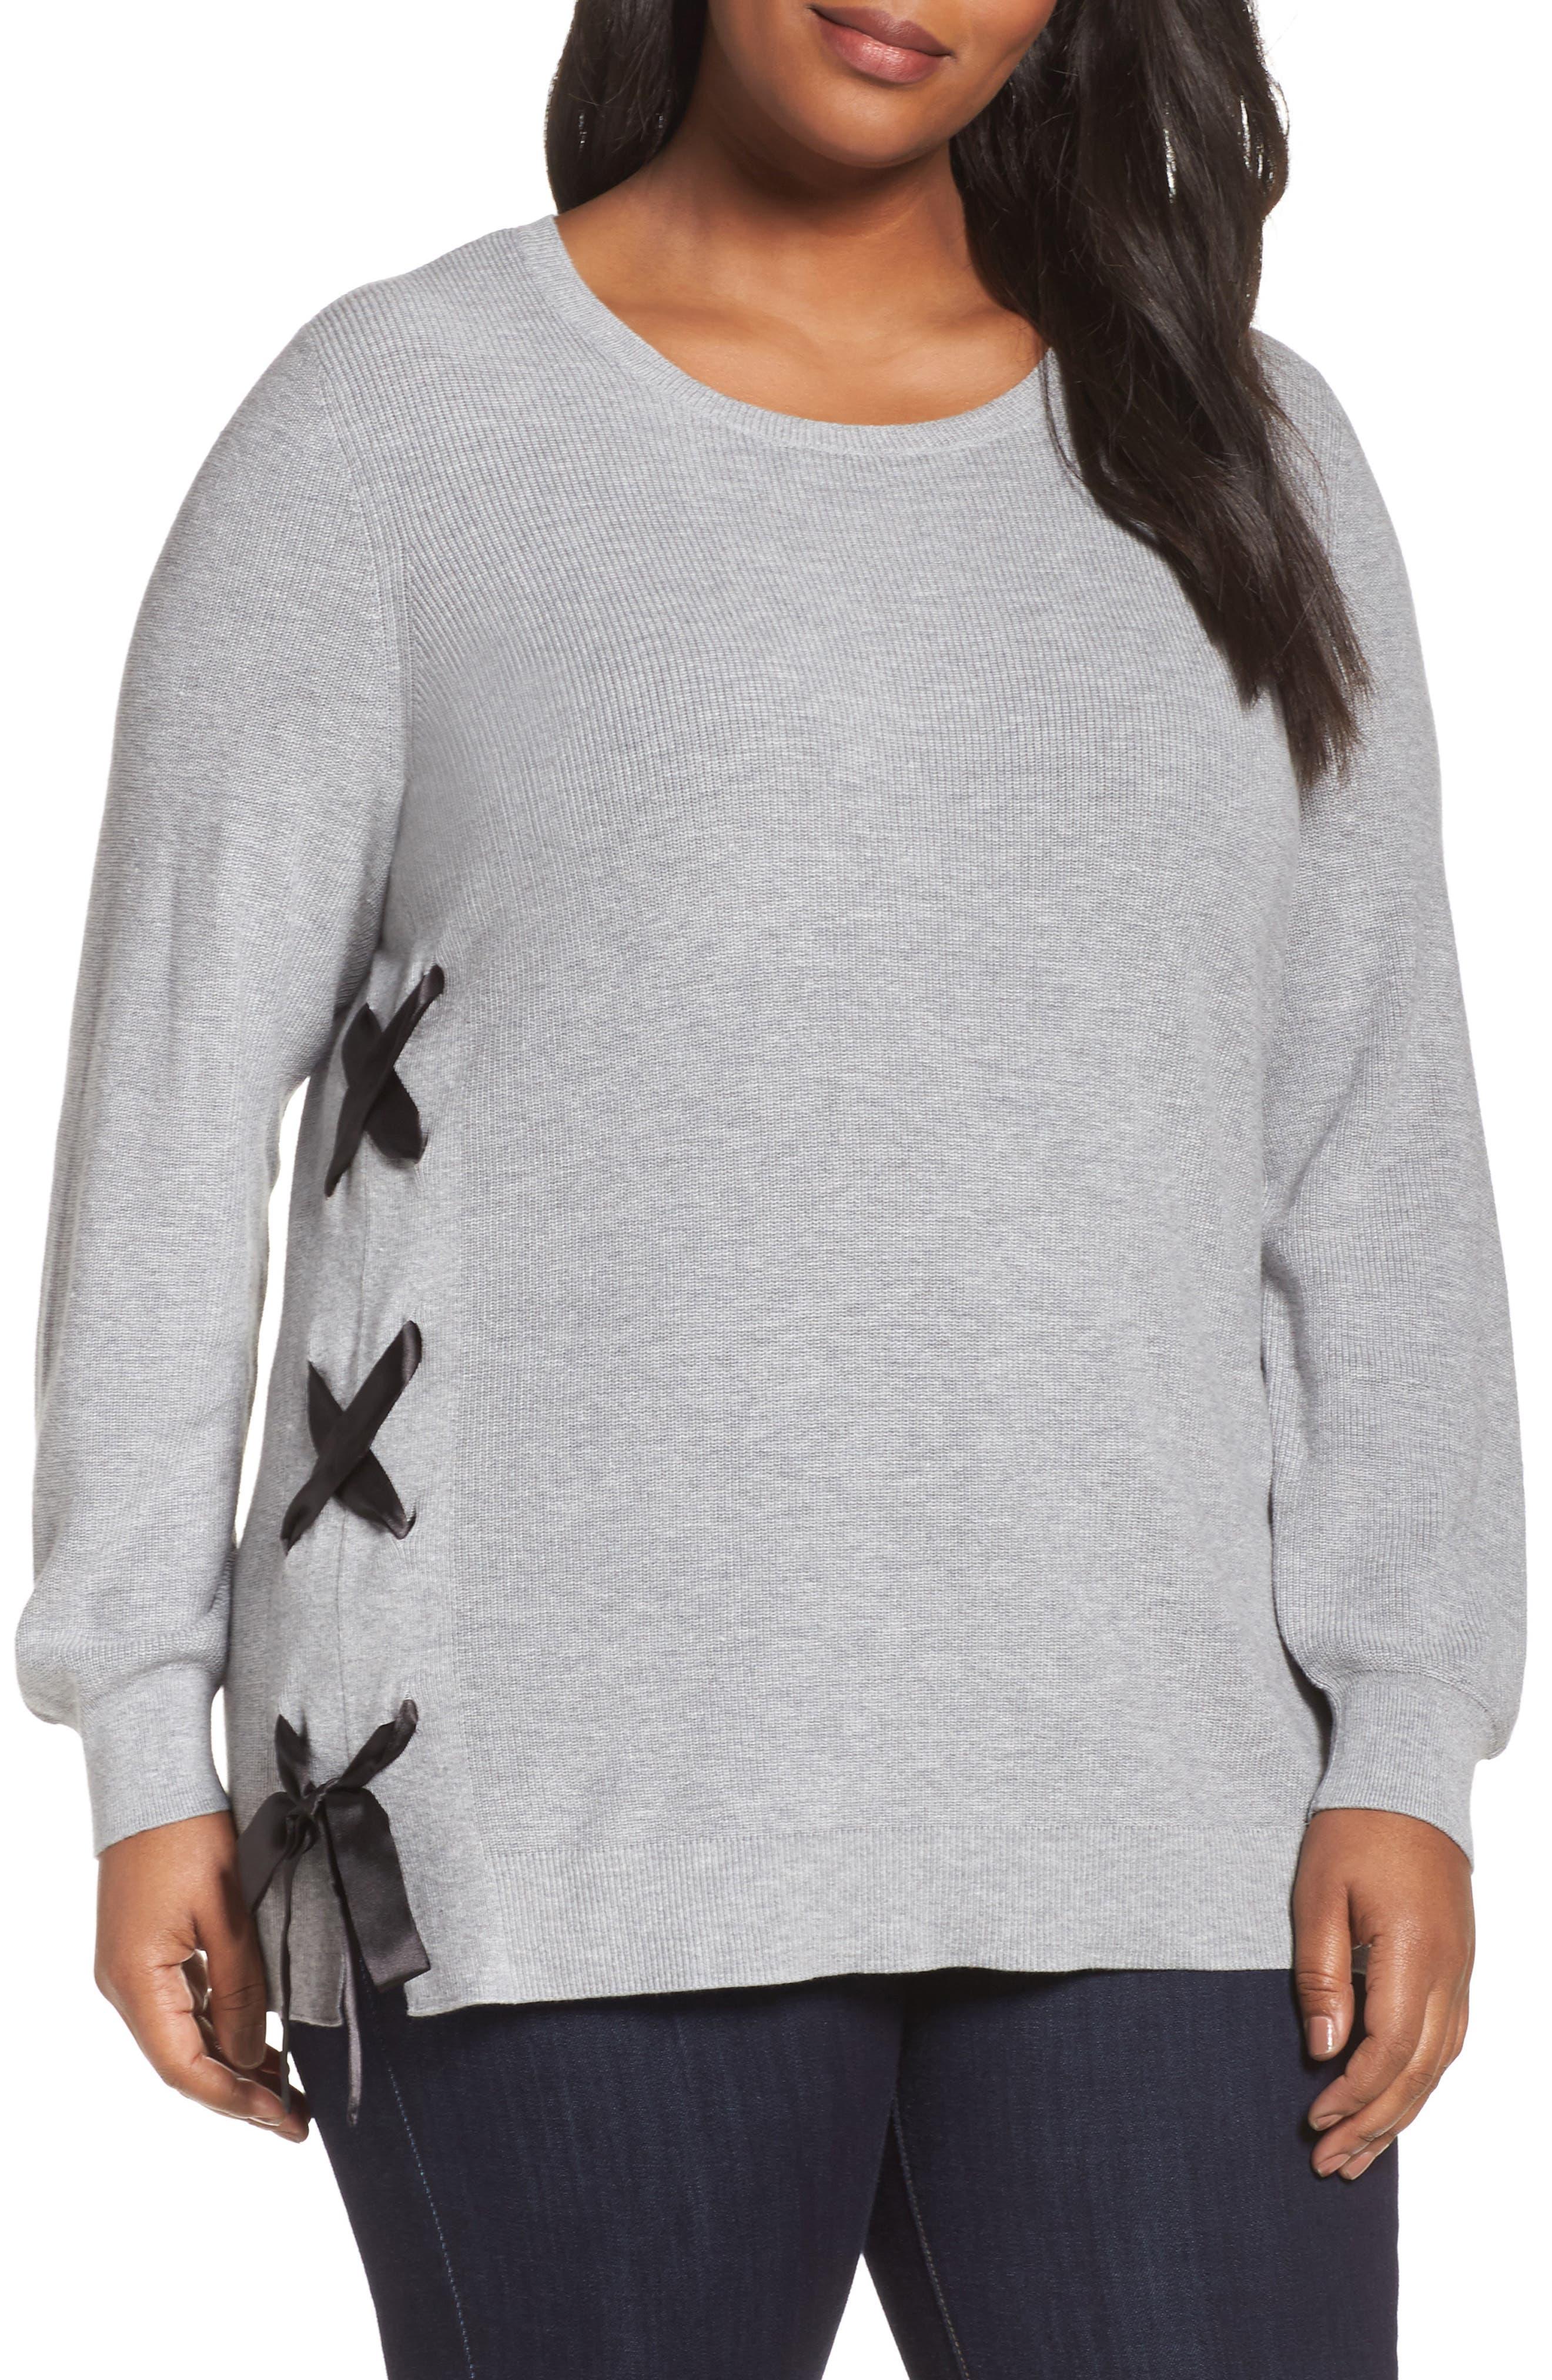 Main Image - Sejour Lace-Up Pullover (Plus Size)